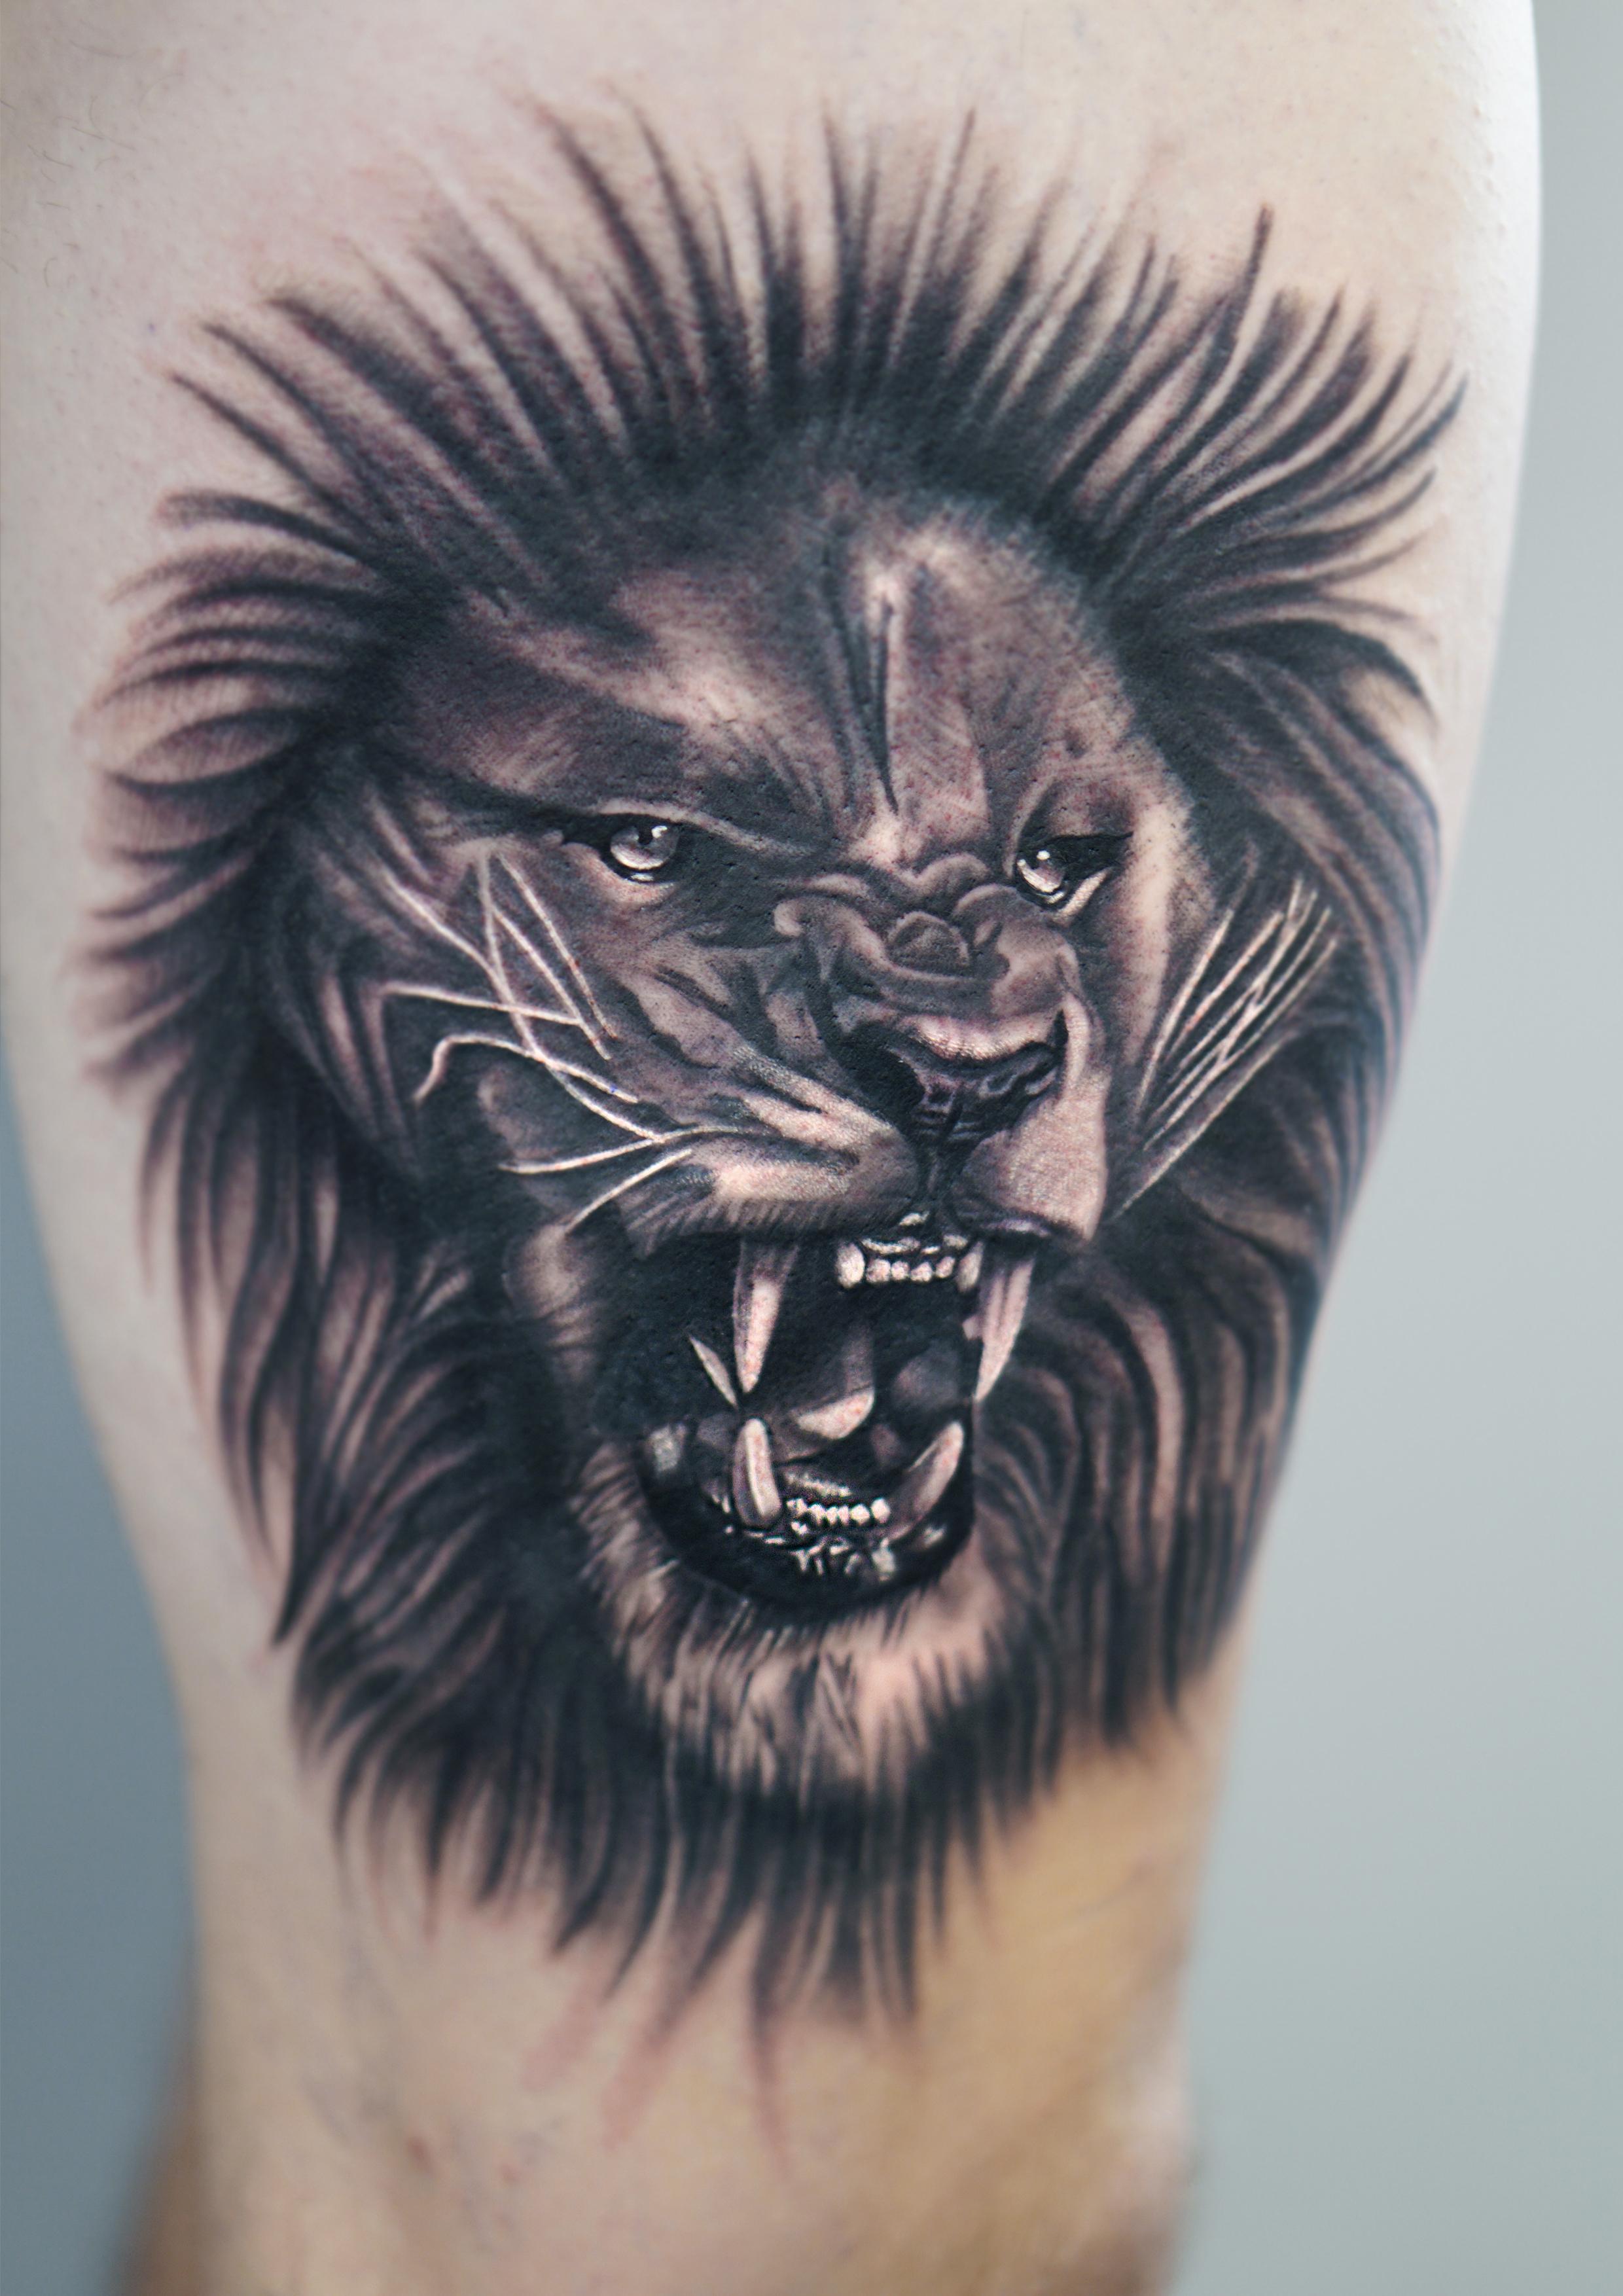 blackhopetattoo colchestertattoo essextattoo realistictattoo blackandgreytattoo Liontattoo thightattoo tattoosformen lion